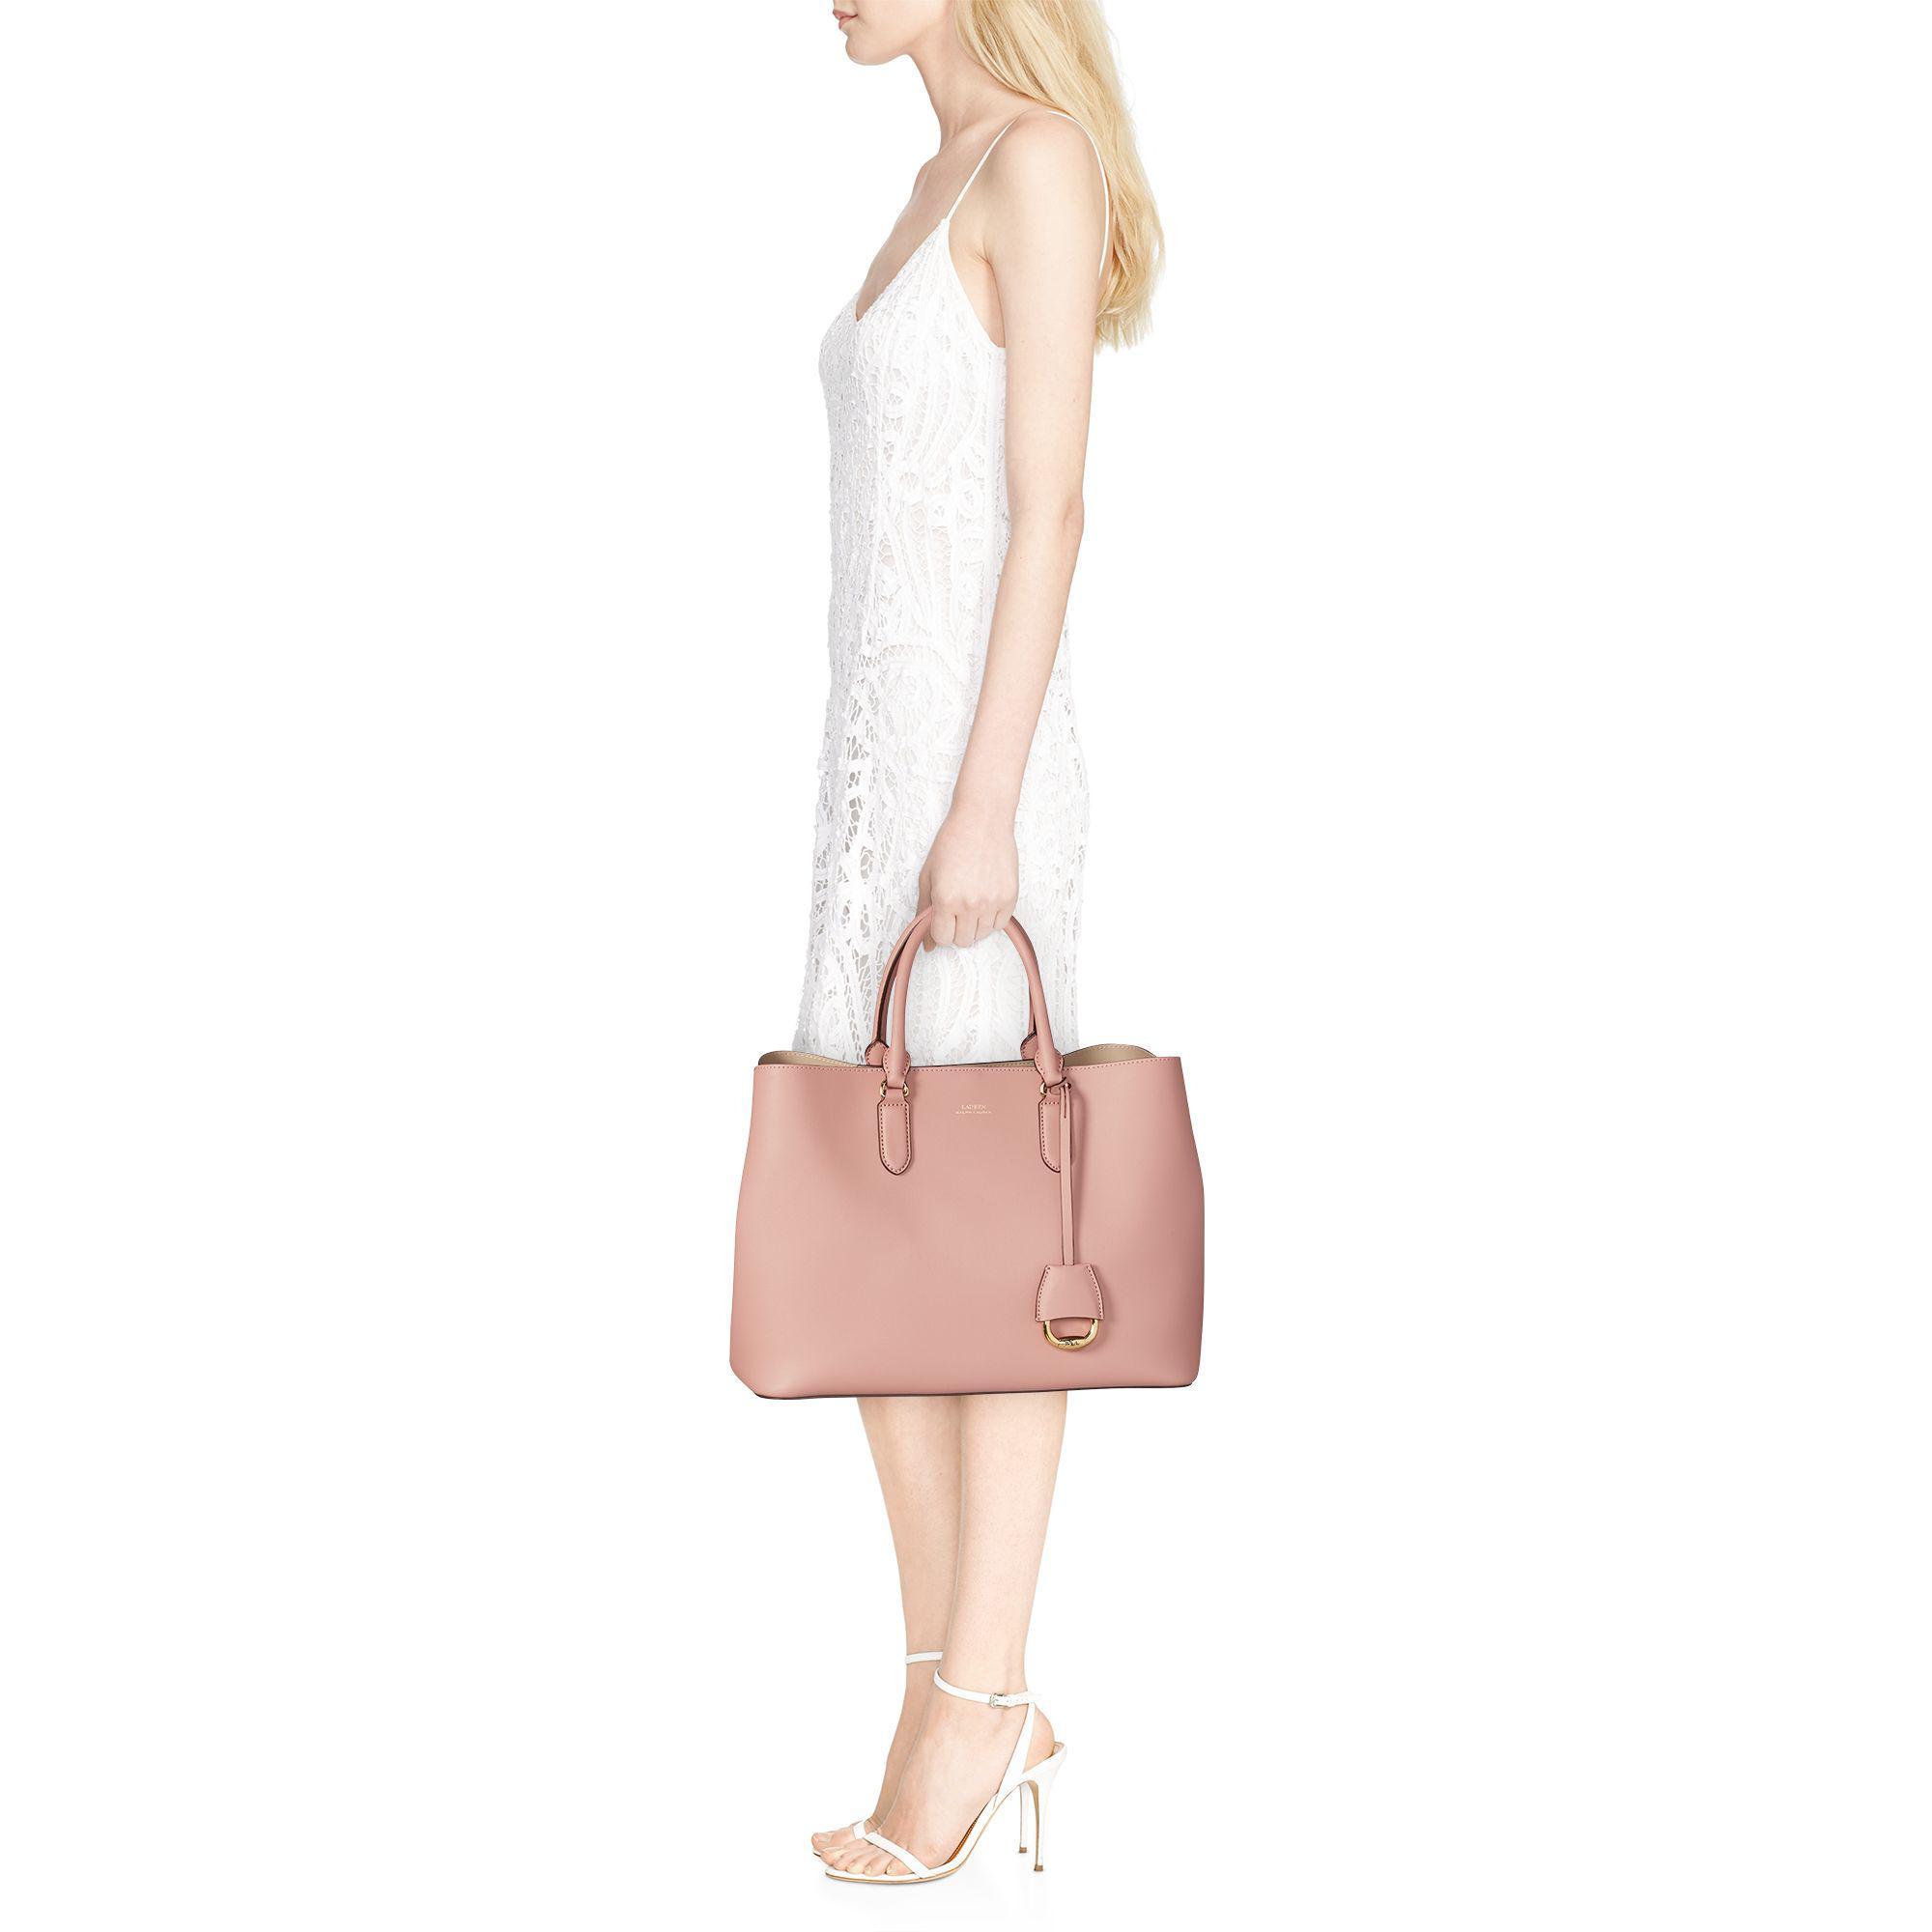 5389be3085 Ralph Lauren Leather Marcy Satchel in Pink - Lyst